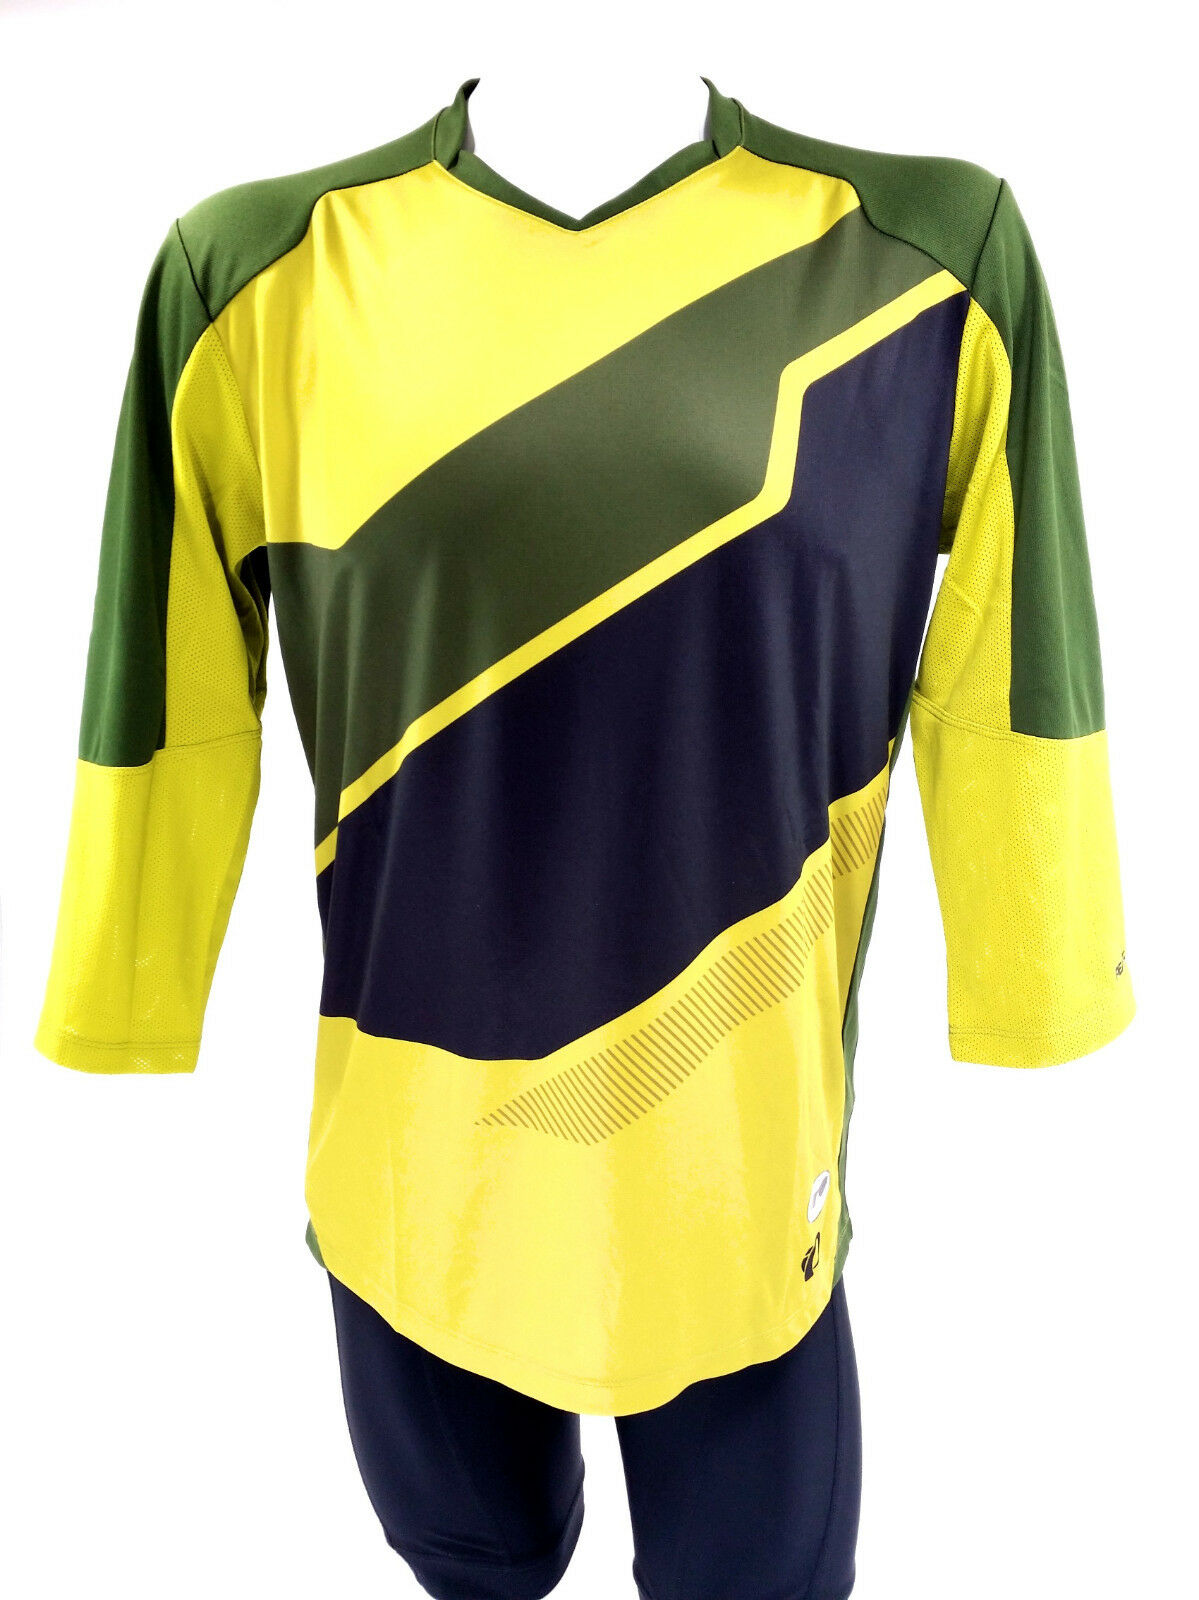 PEARL iZUMI Launch 3 4 Sleeve Jersey, Green Yellow, Medium